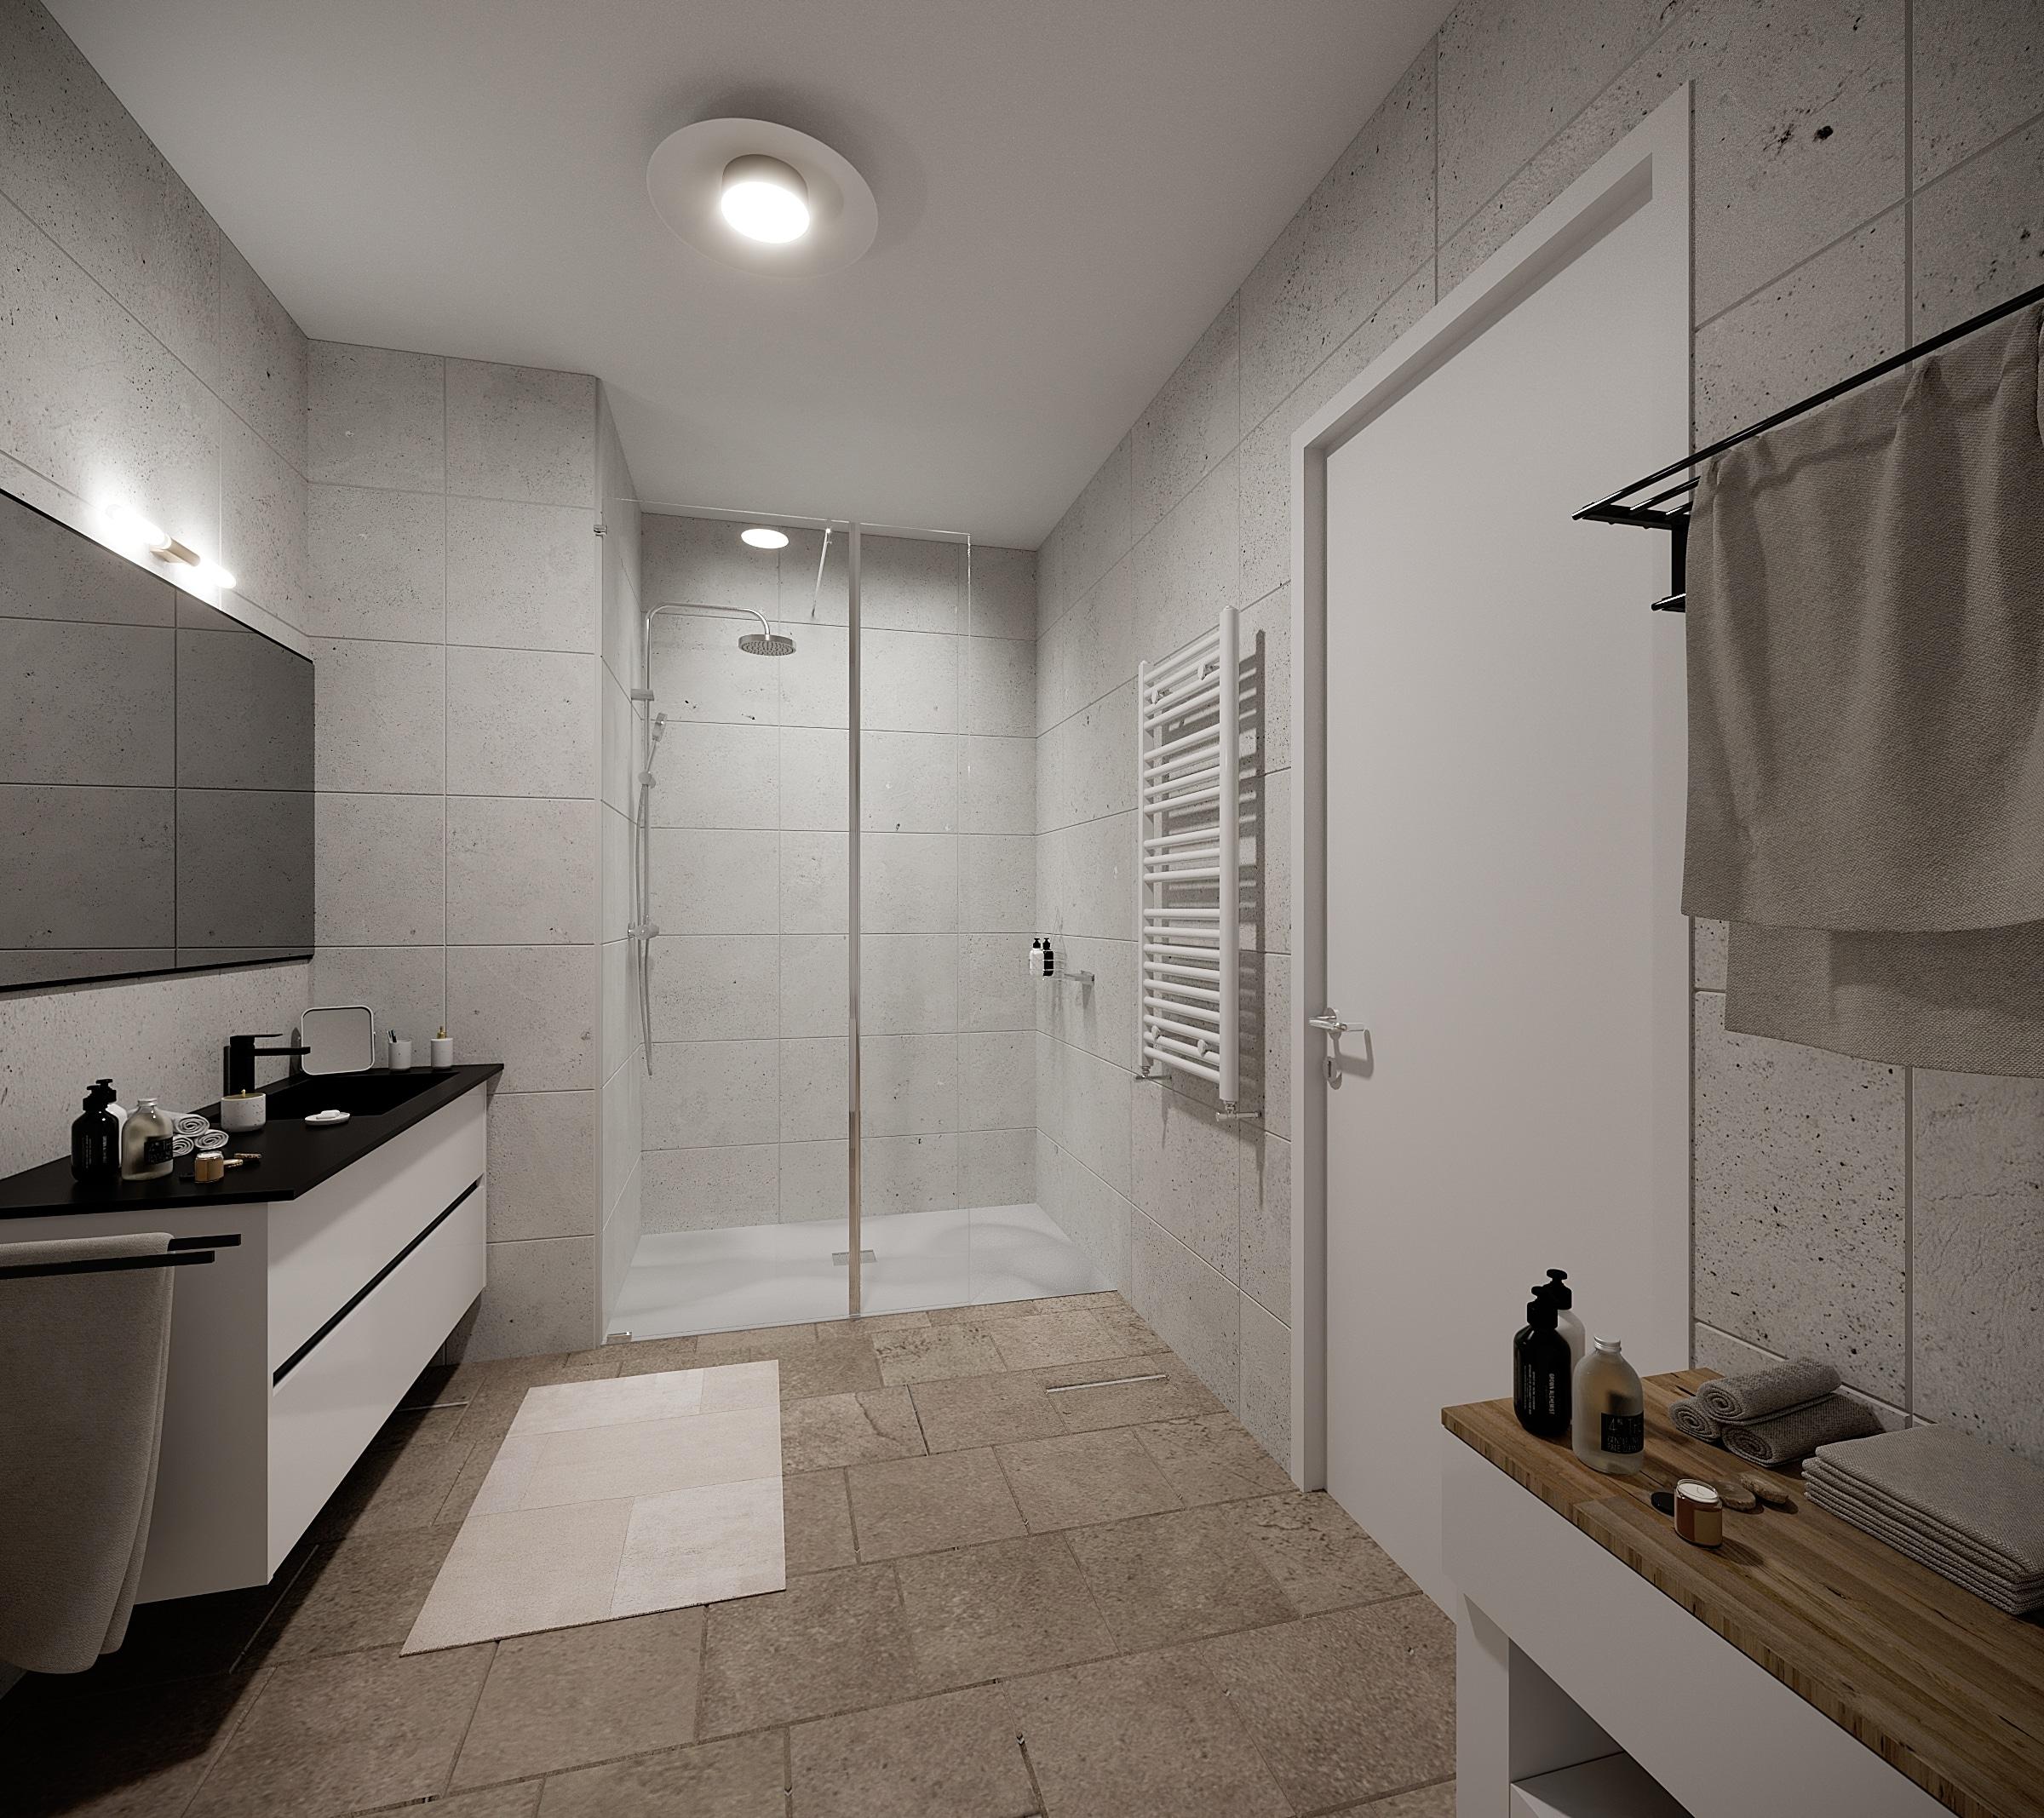 Salle de bain ecoshower douche moderne